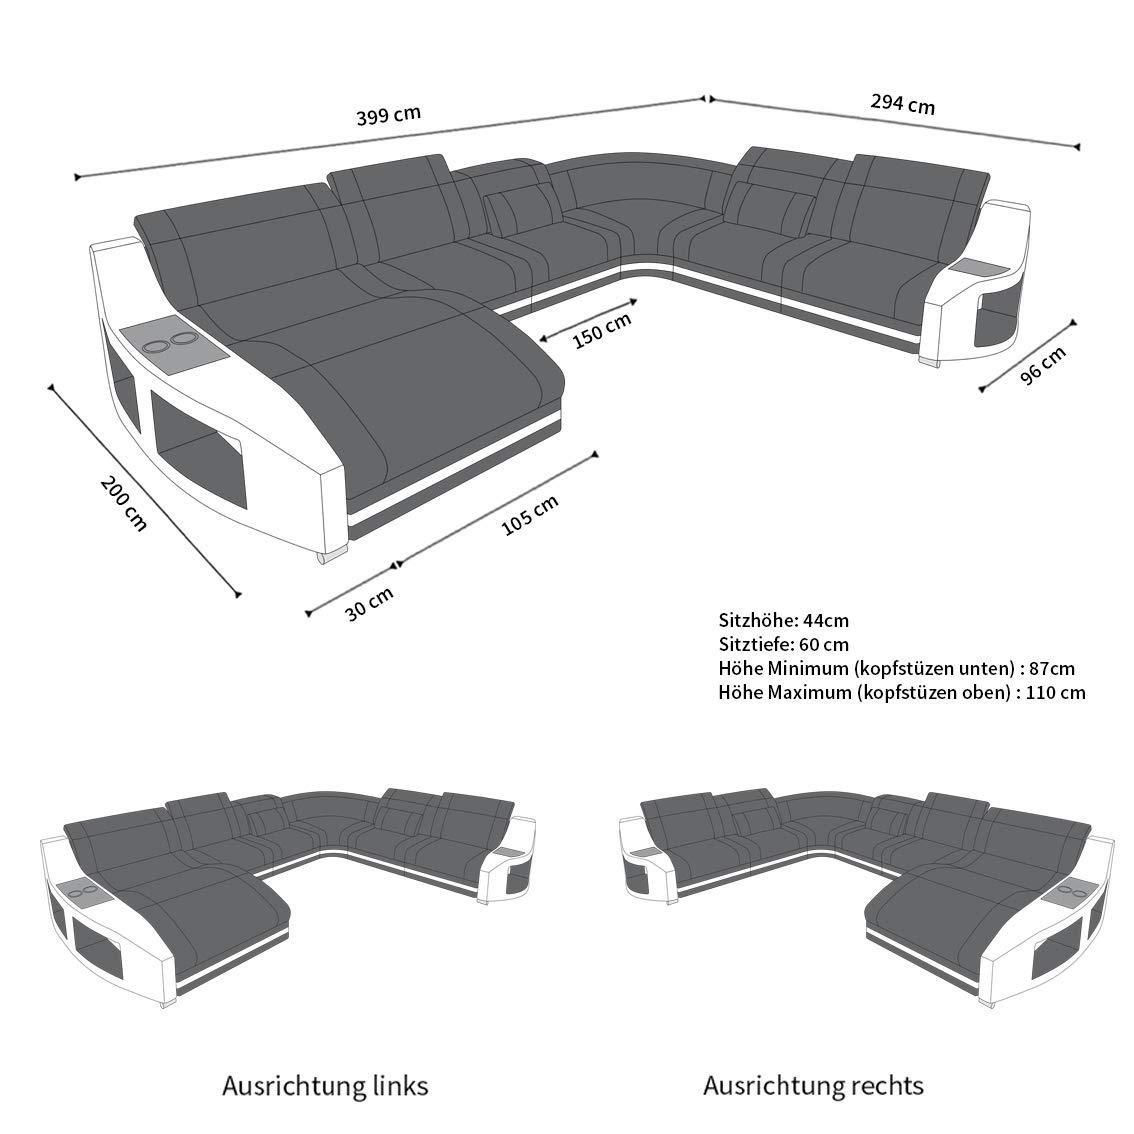 Amazoncom Sectional Sofa Palm Beach By Sofadreams Kitchen